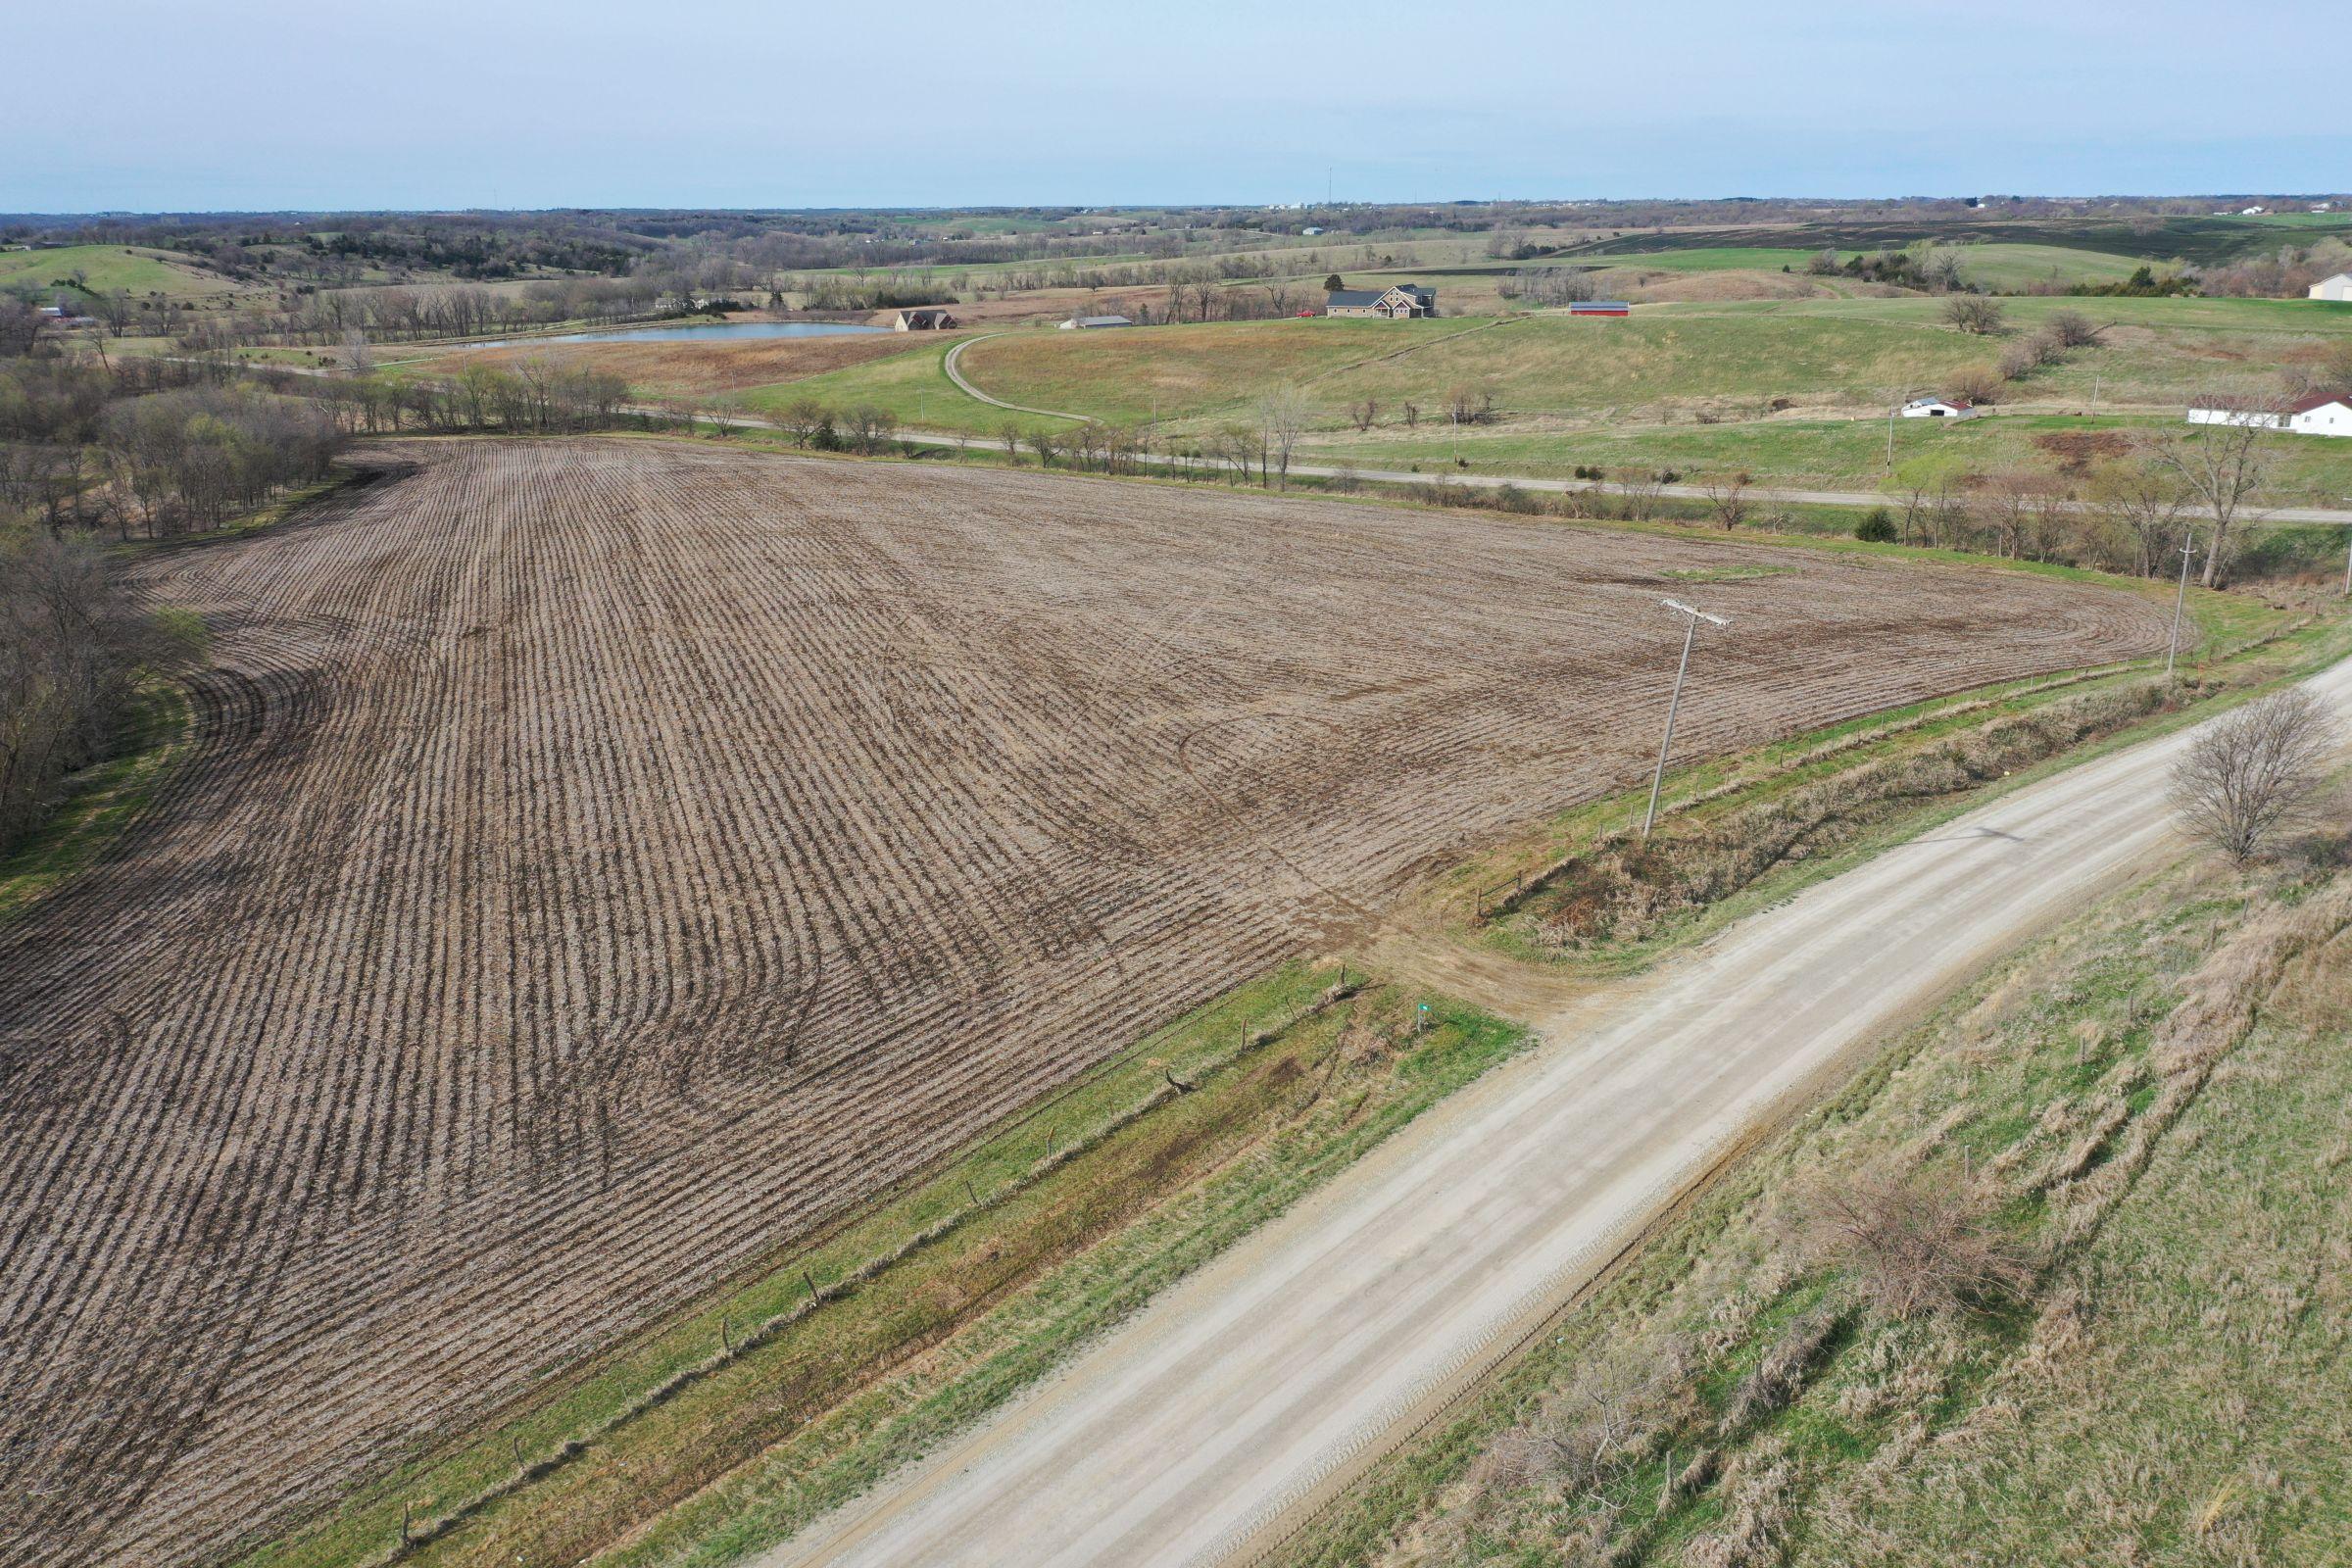 land-warren-county-iowa-3-acres-listing-number-15478-3-2021-04-21-184712.JPG